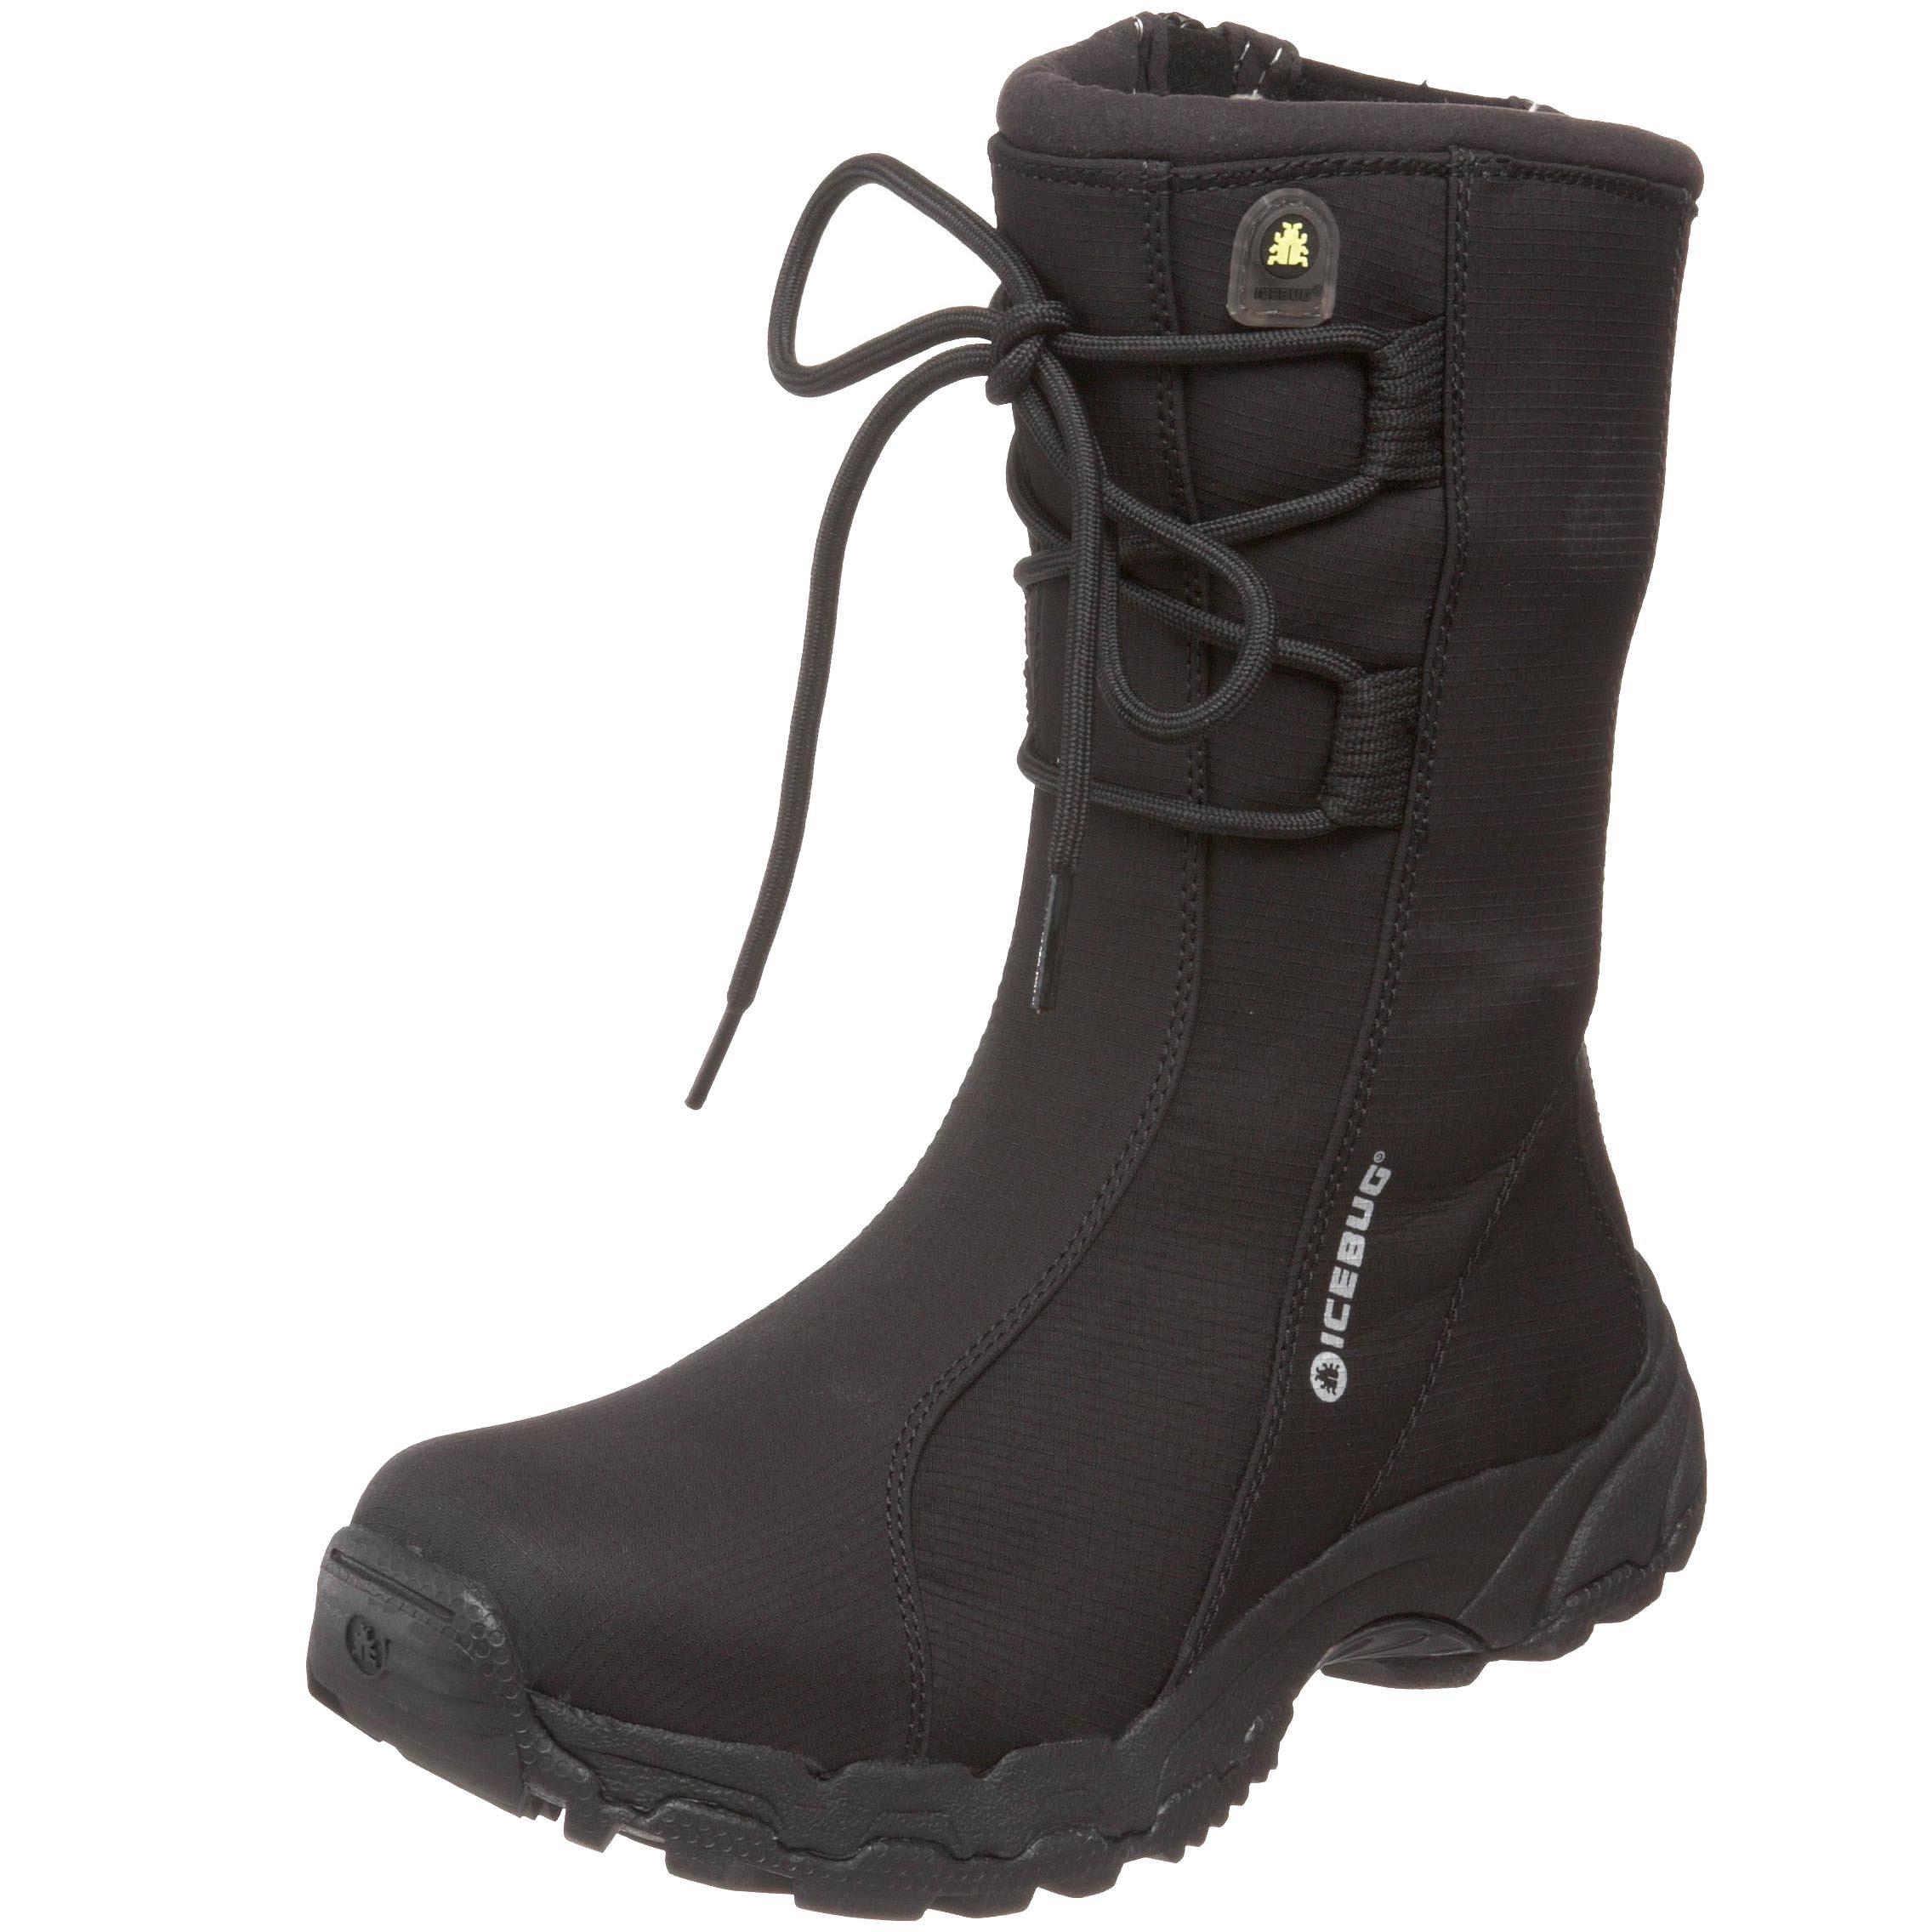 Icebug Women's Cortina BUGsole Studded Winter Boot,Black,10.5 US